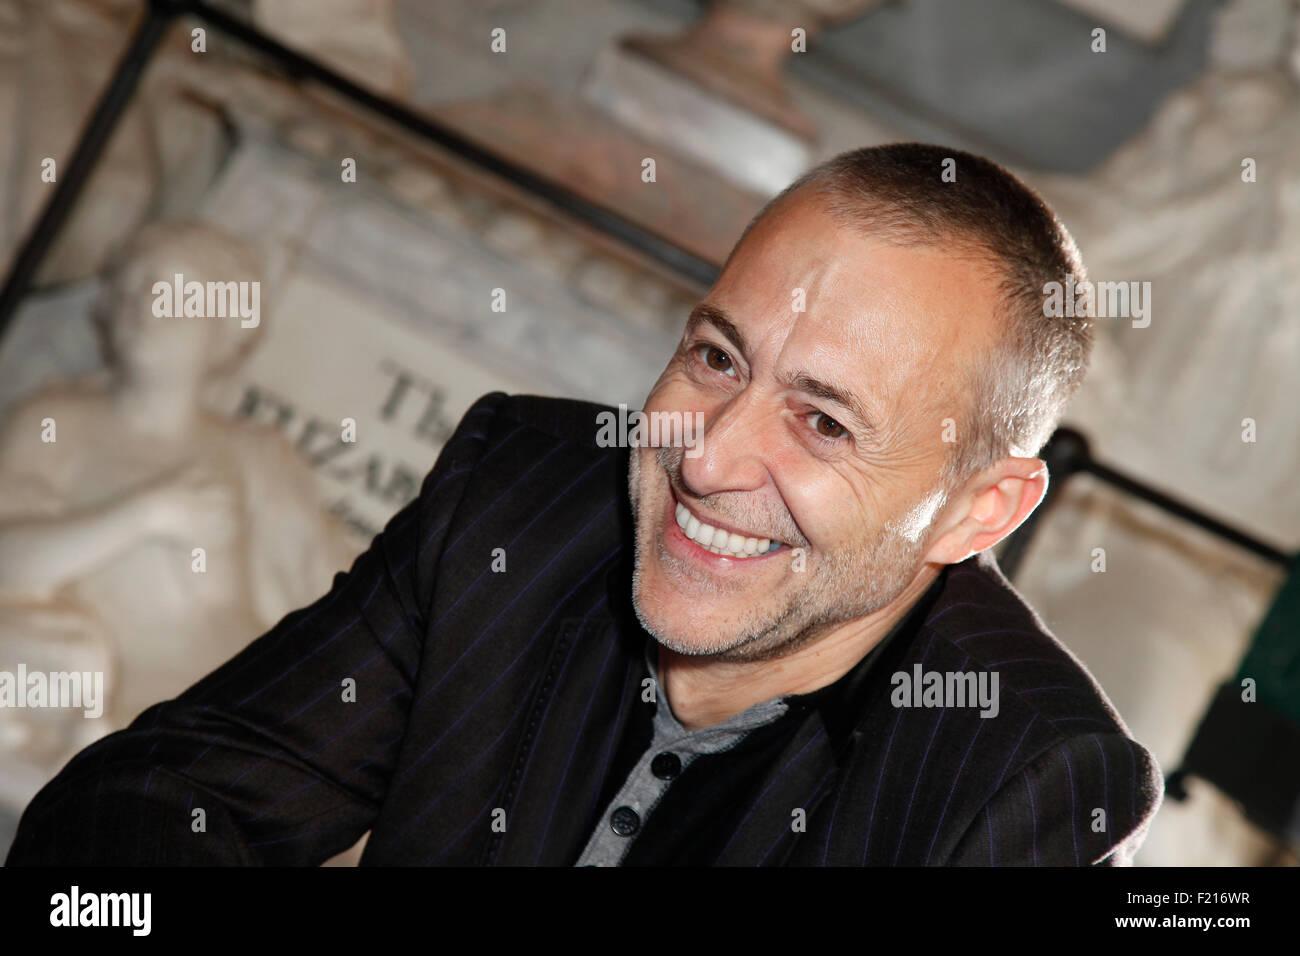 Menschen, Famous, Starkoch Michel Roux Junior. Stockbild